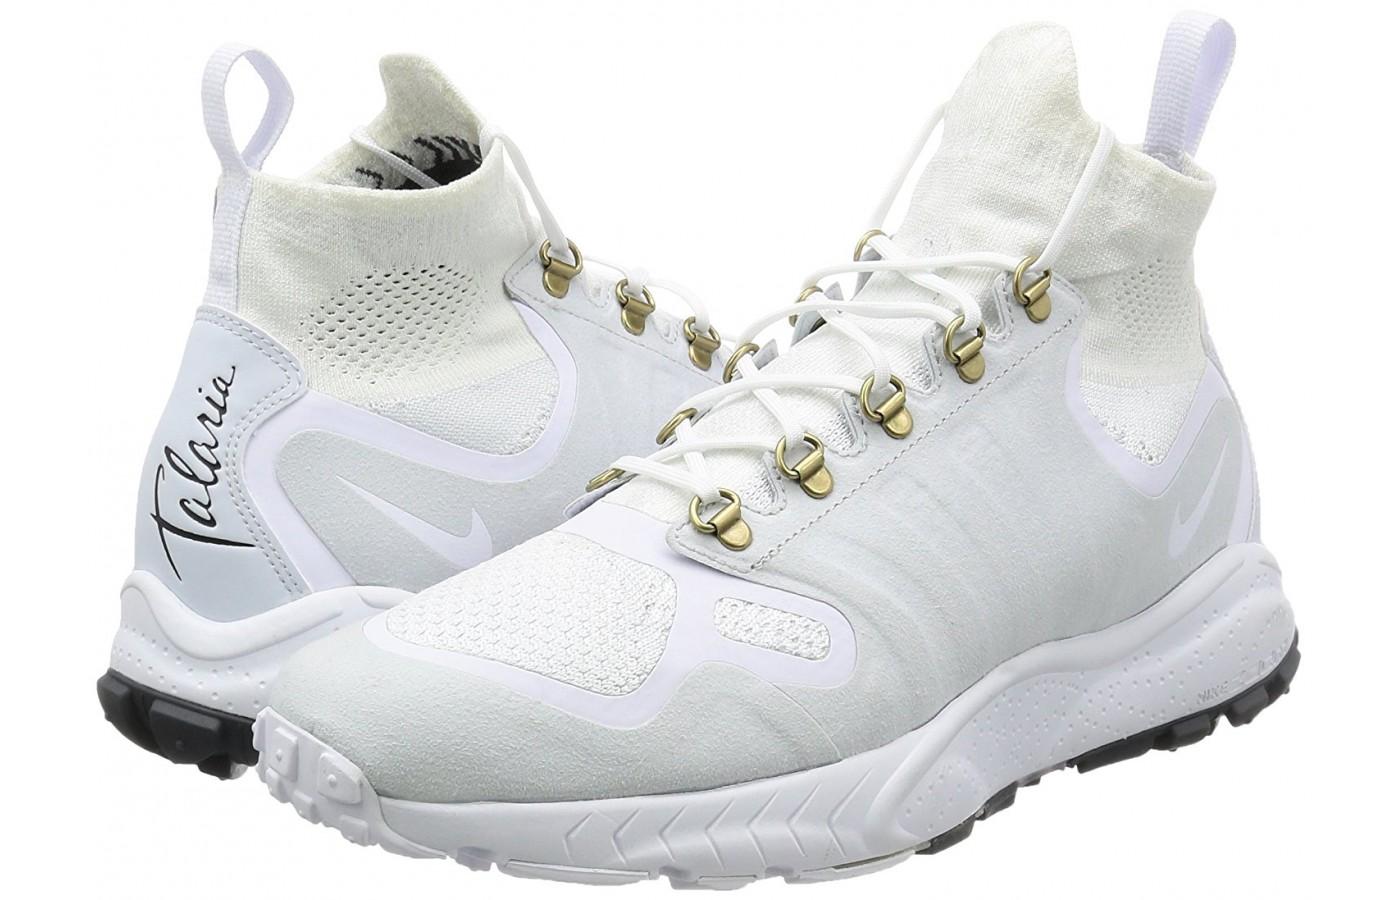 Nike Zoom Talaria Flyknit Pair